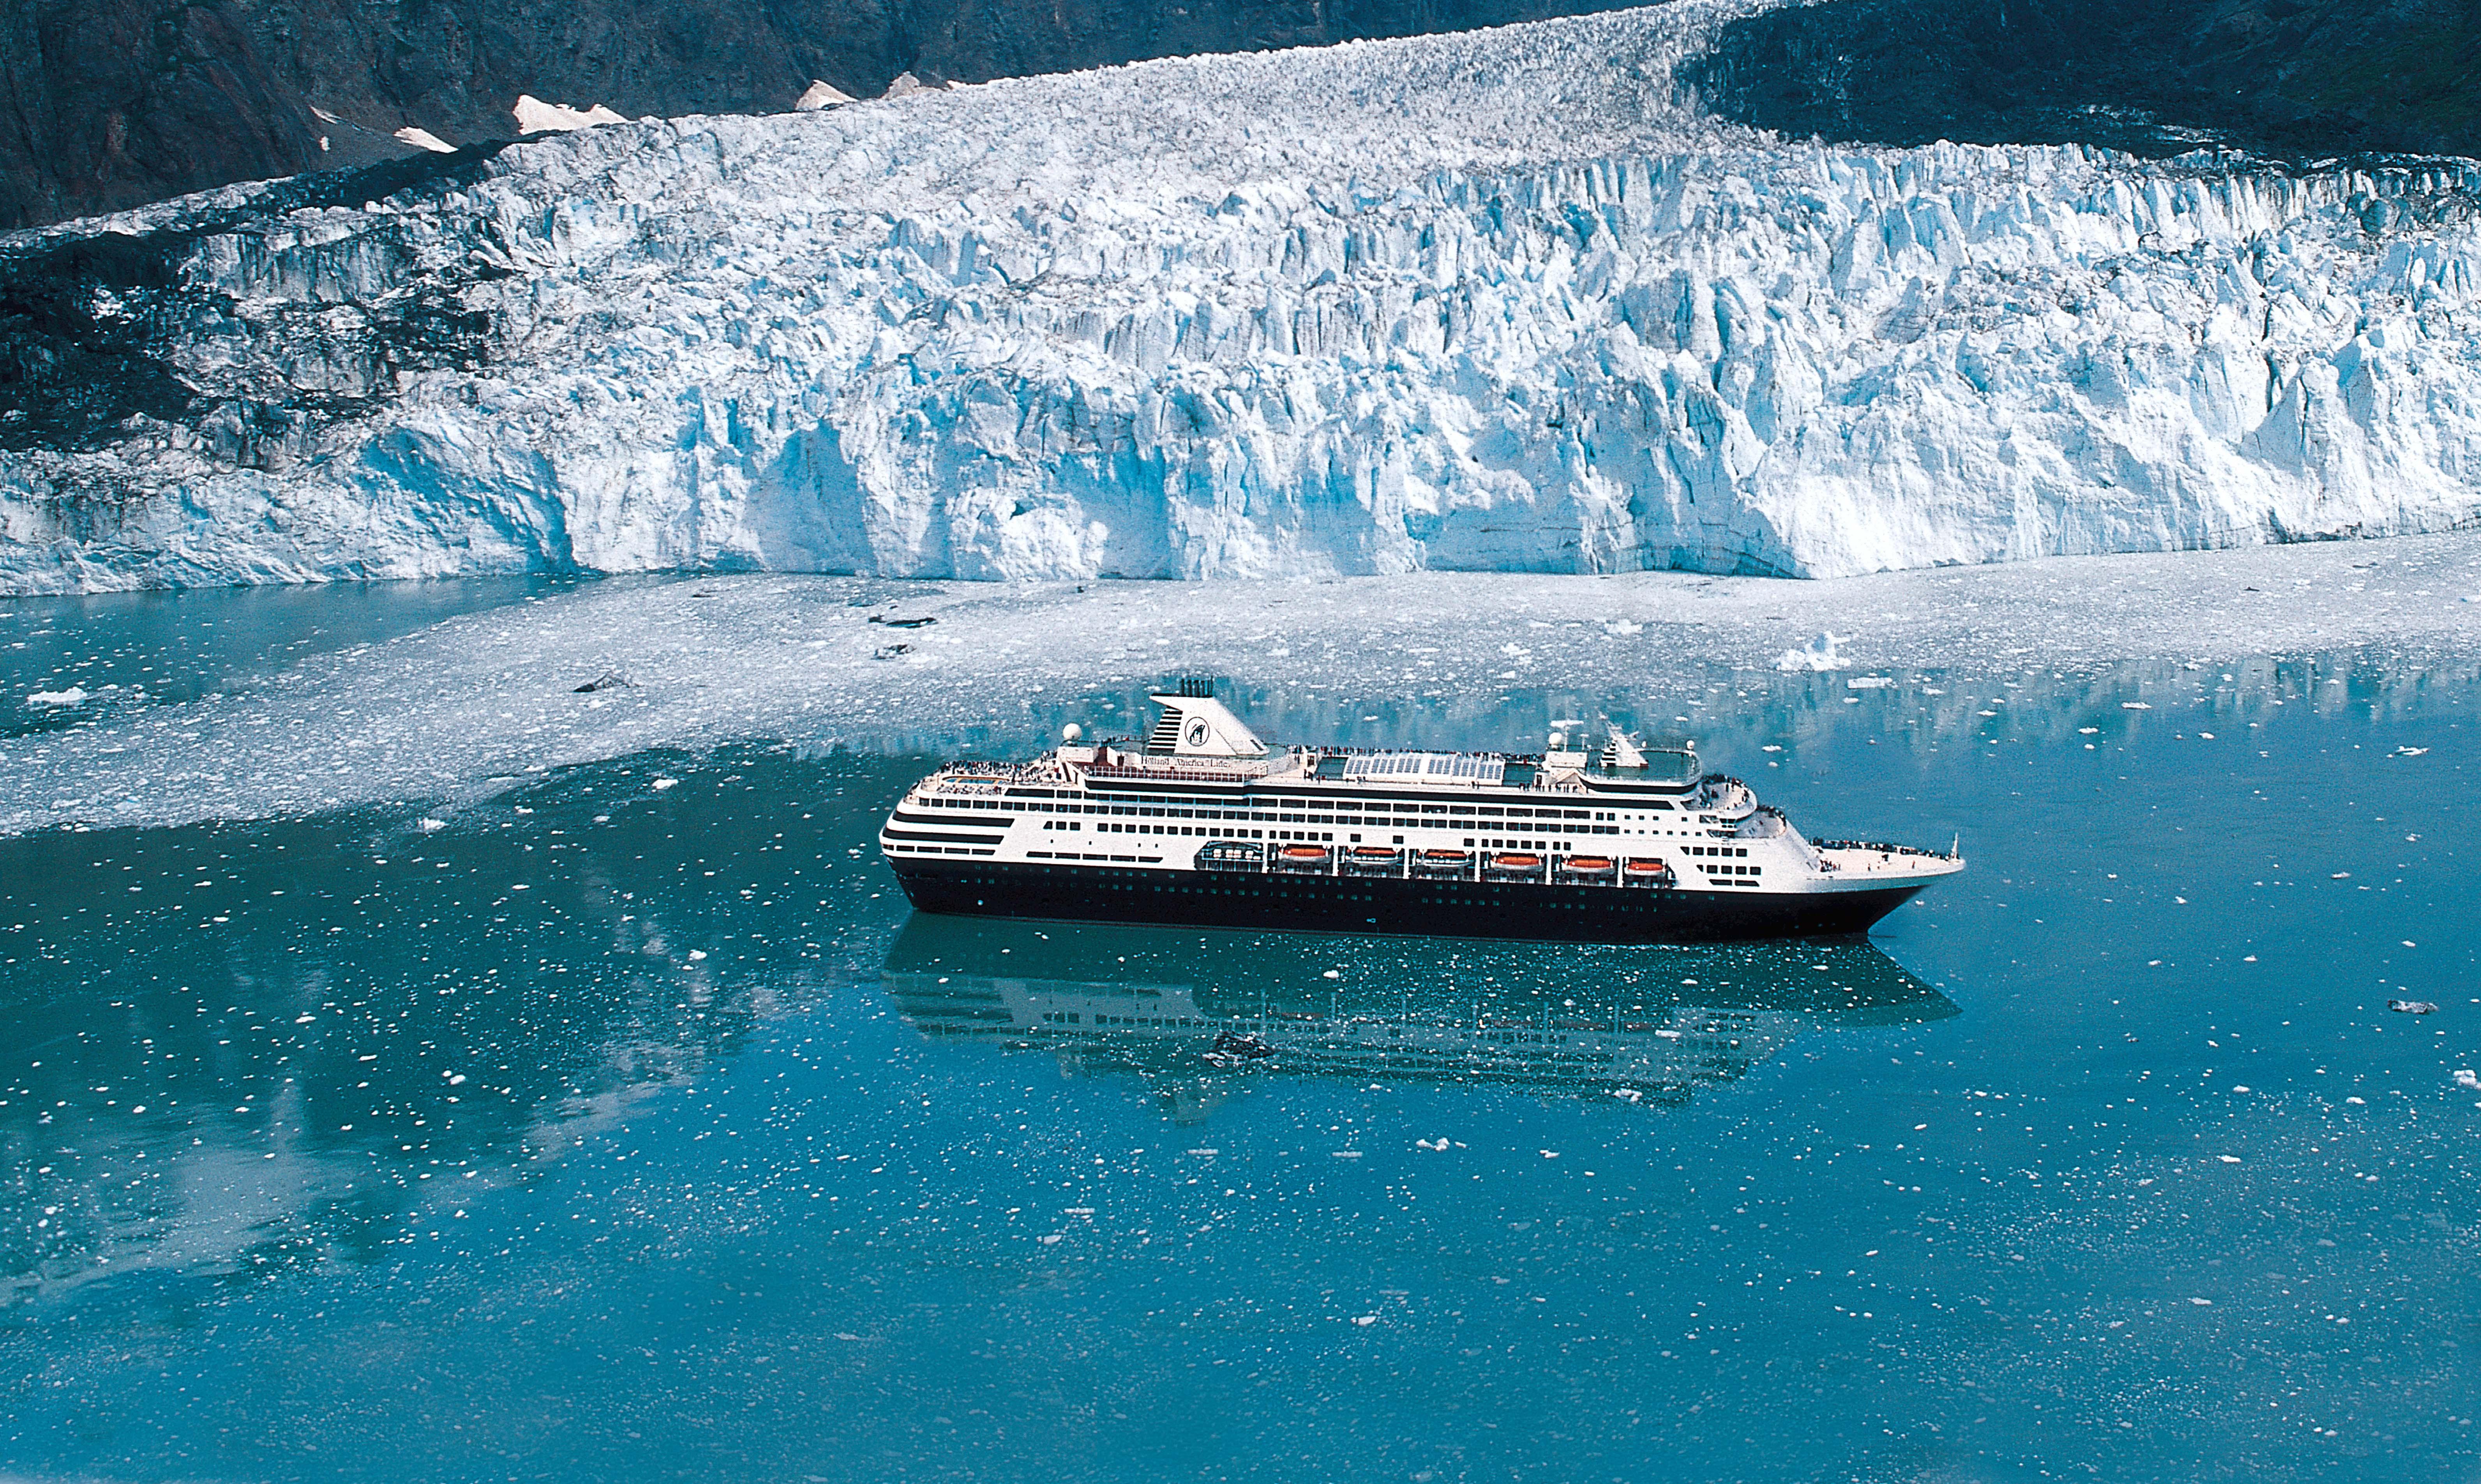 The Rockies Amp Alaska Cruises Canada Holidays 2015 2016